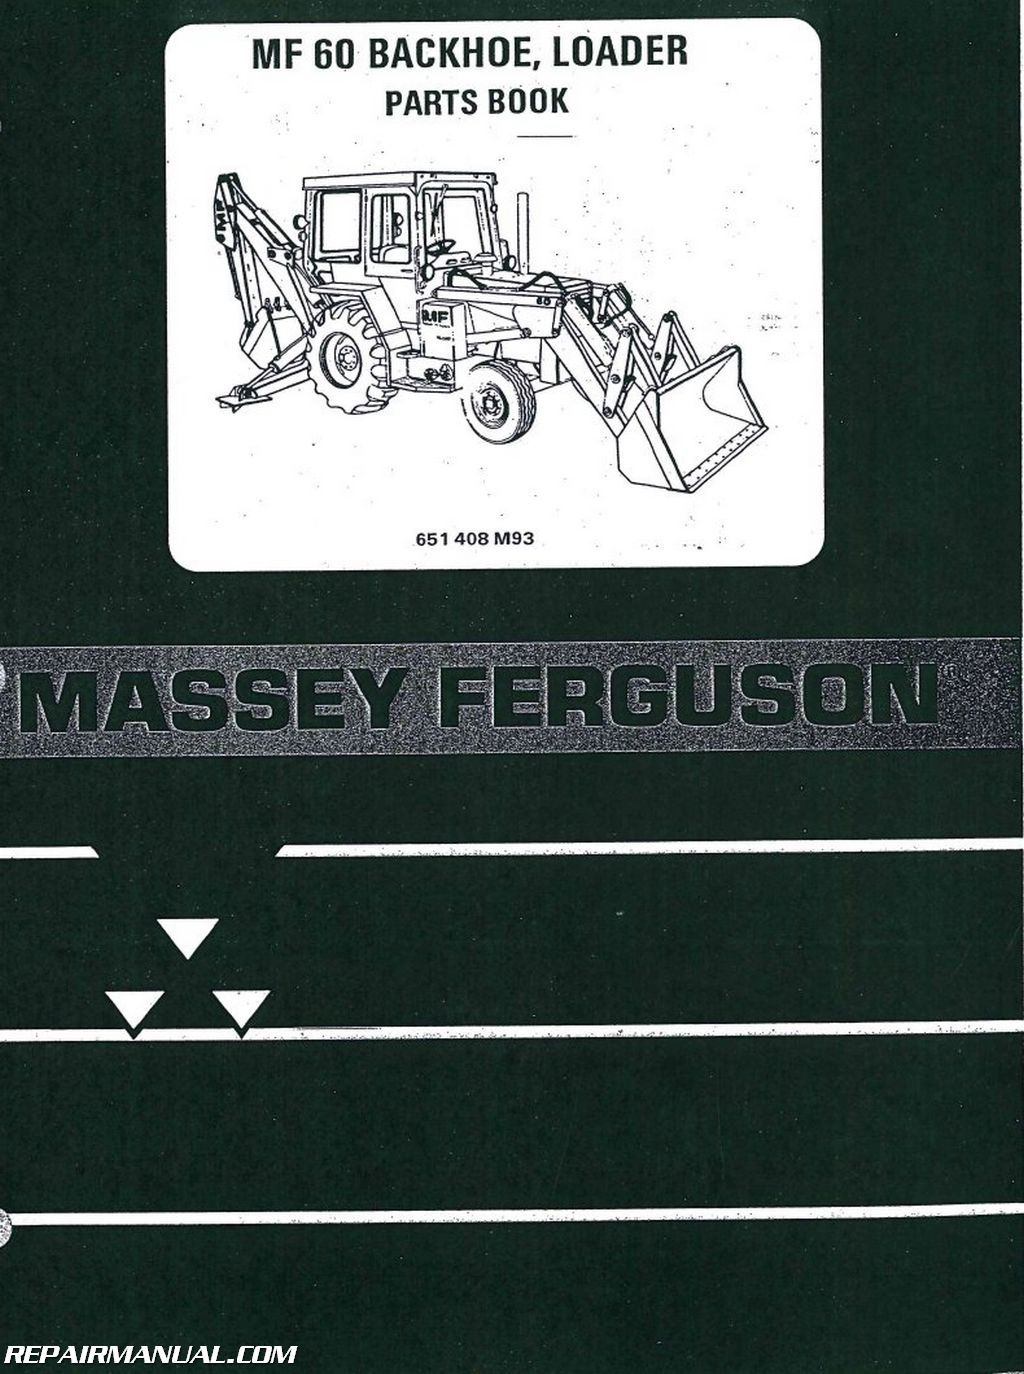 Massey Ferguson Mf60 Tractor Loader Backhoe Parts Manual